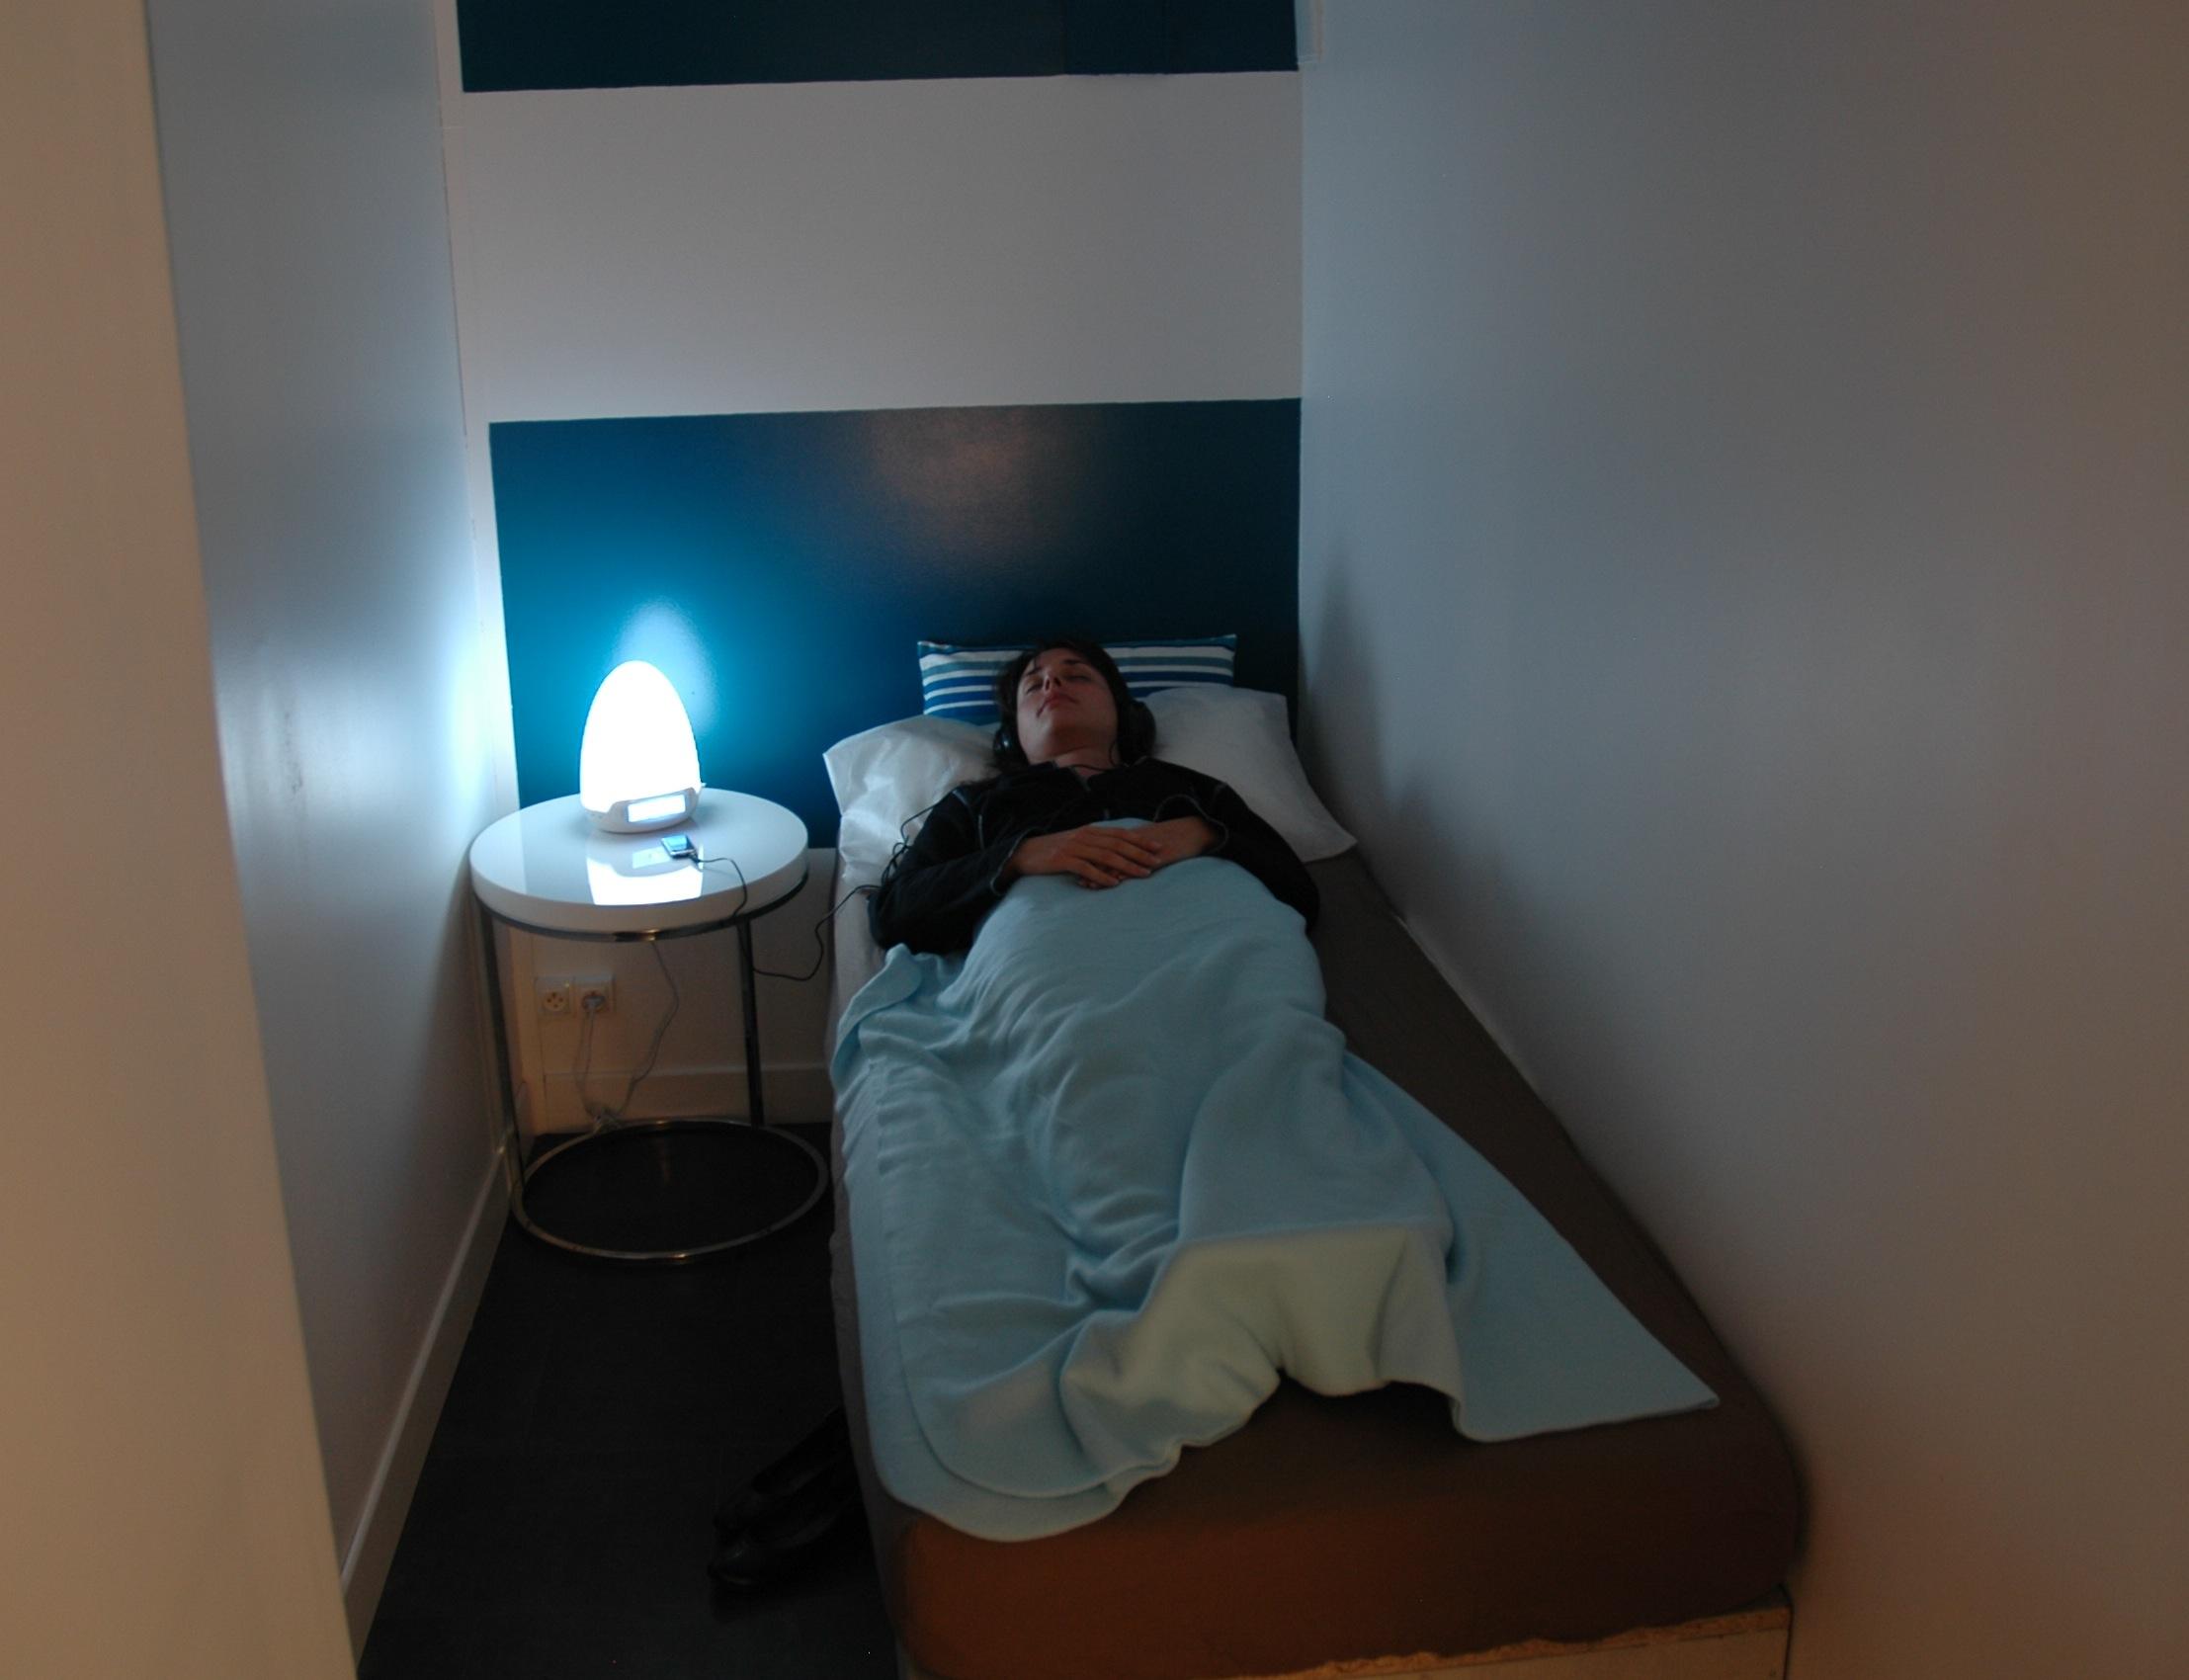 bar a oxygene paris bar oxyg ne paris chez relaxity. Black Bedroom Furniture Sets. Home Design Ideas